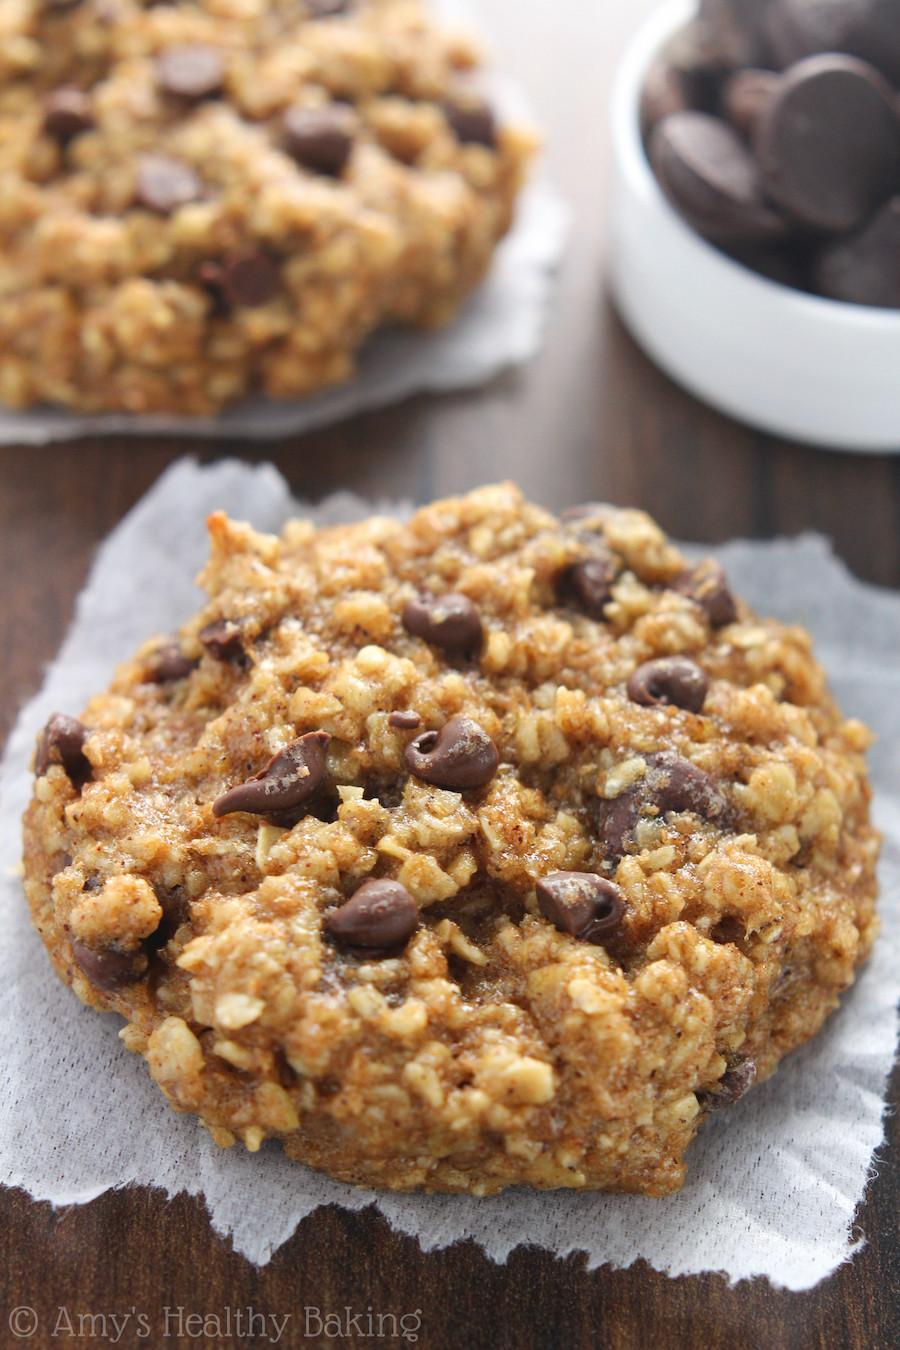 Healthy Cookies Recipe  Chocolate Chip Banana Bread Oatmeal Cookies